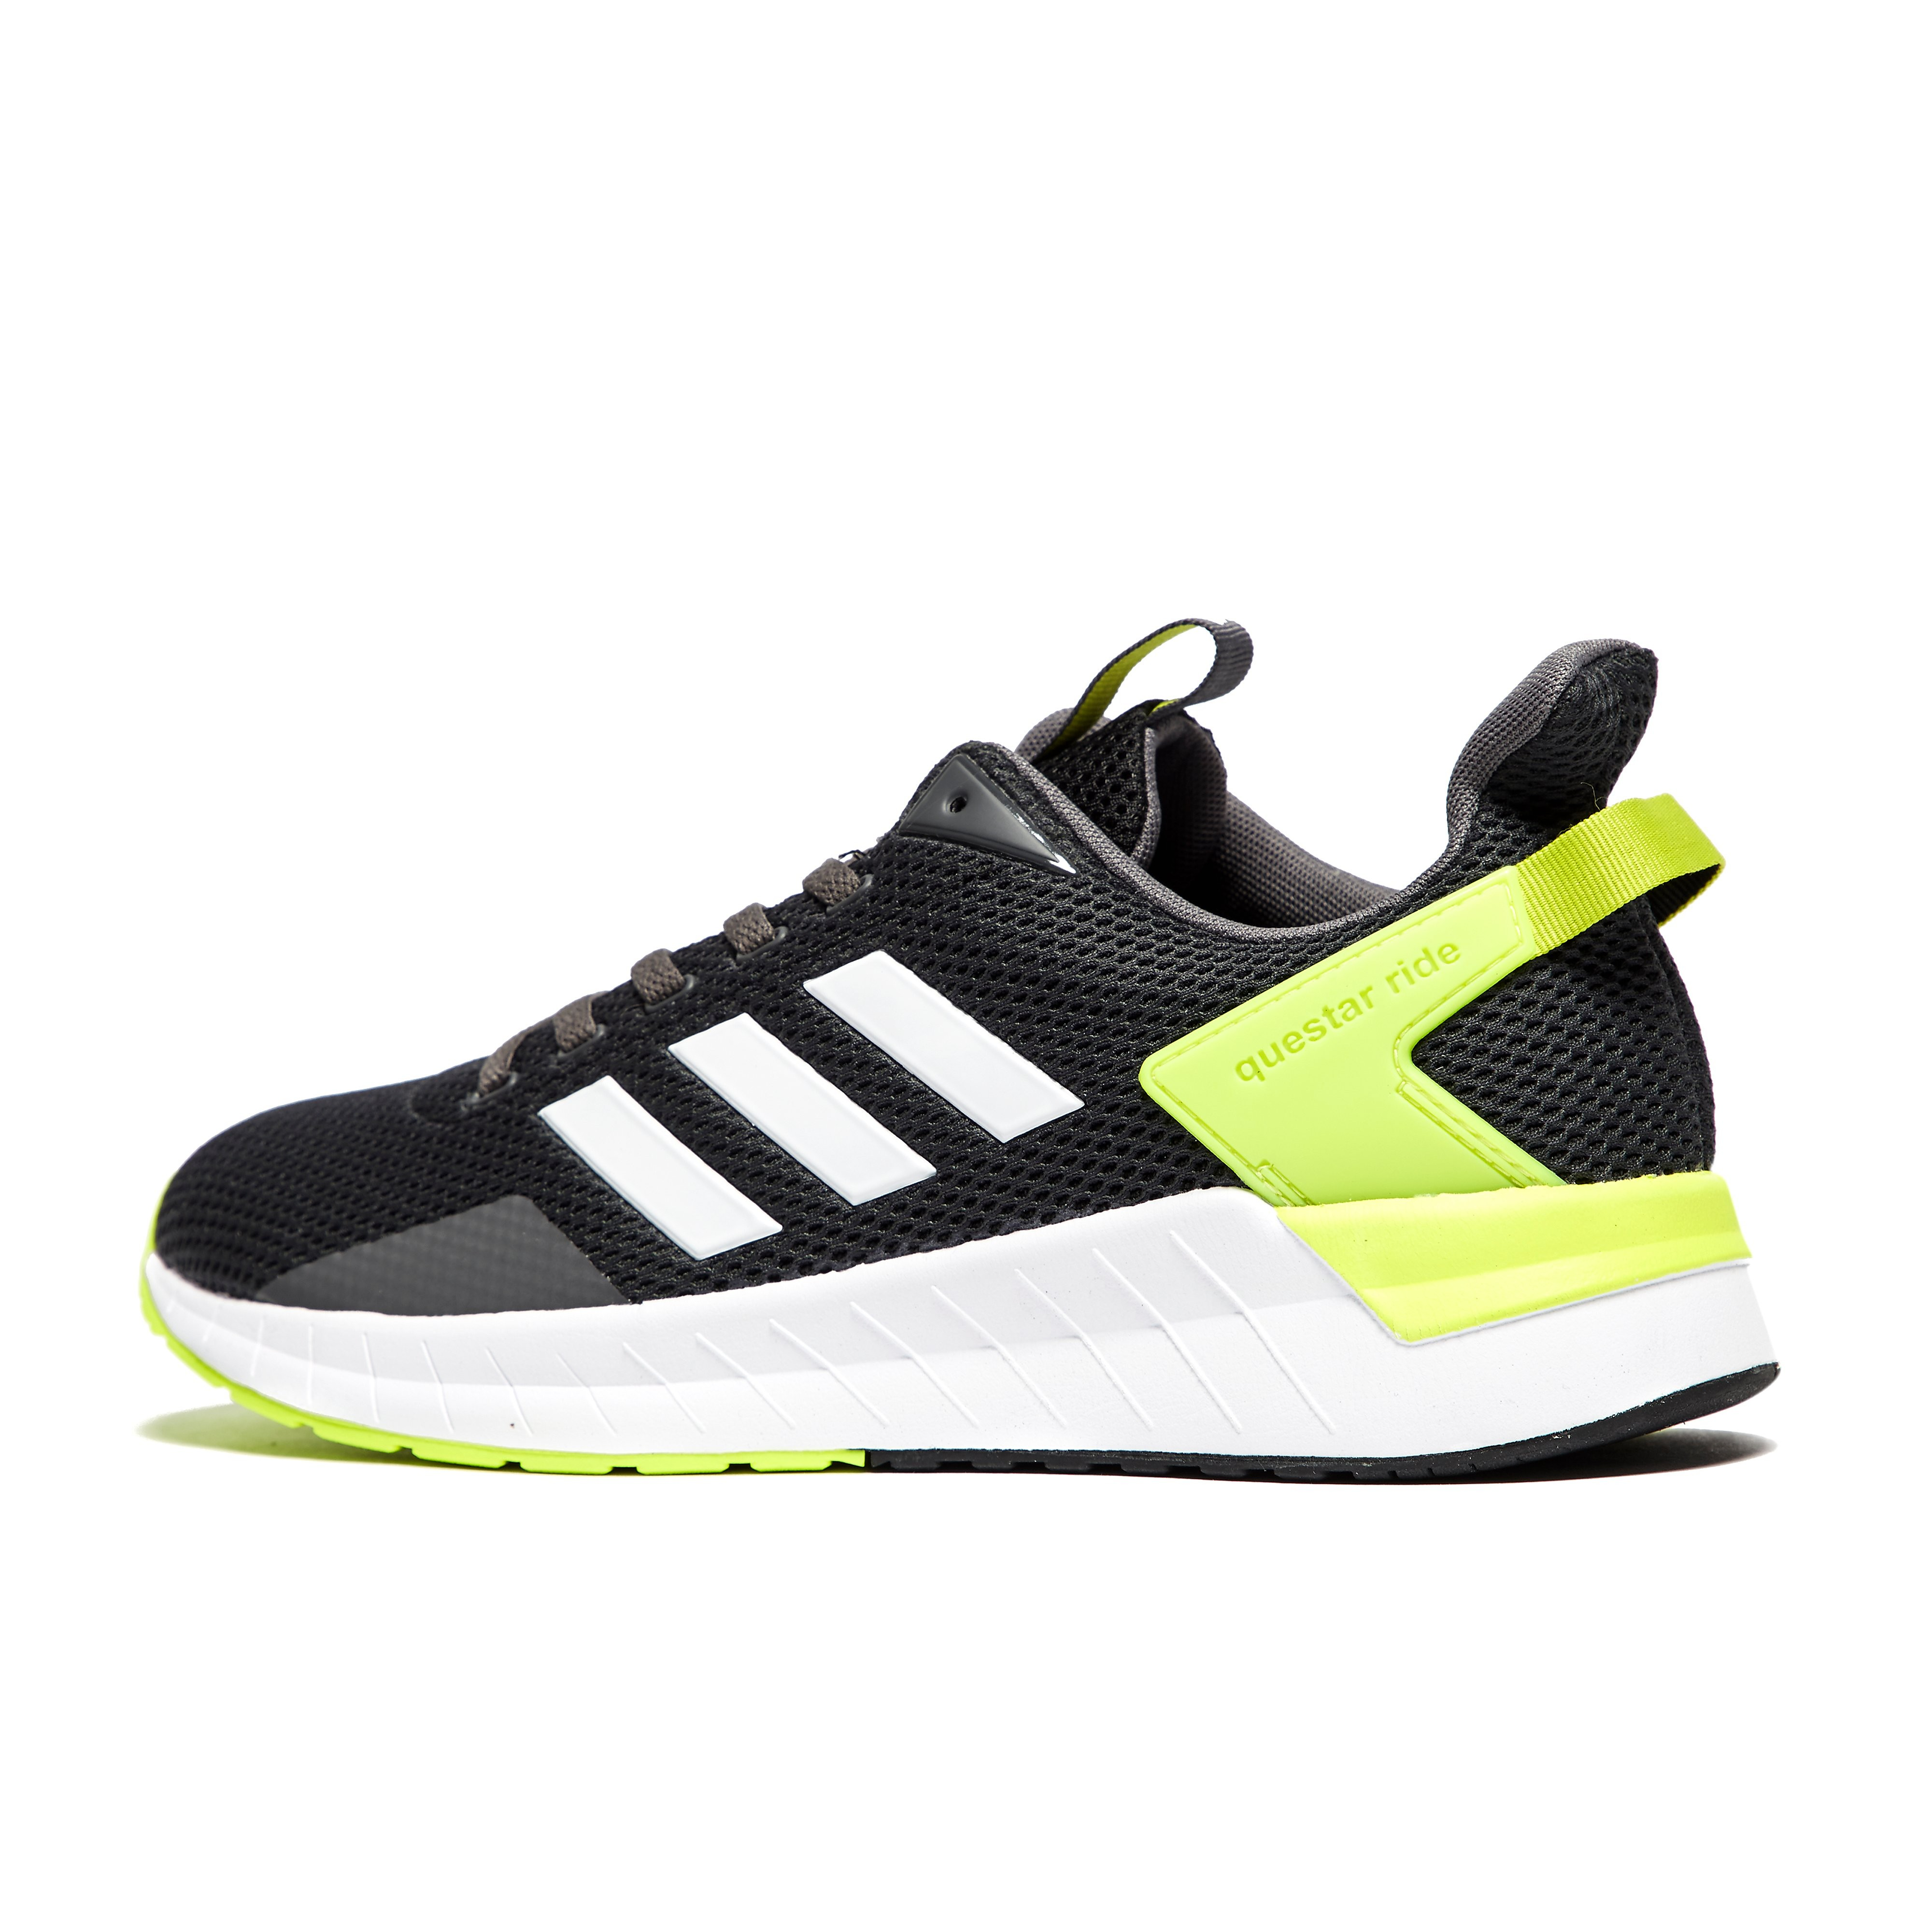 adidas scarpe da corsa adizero ultra spinta, sprintstar activinstinct